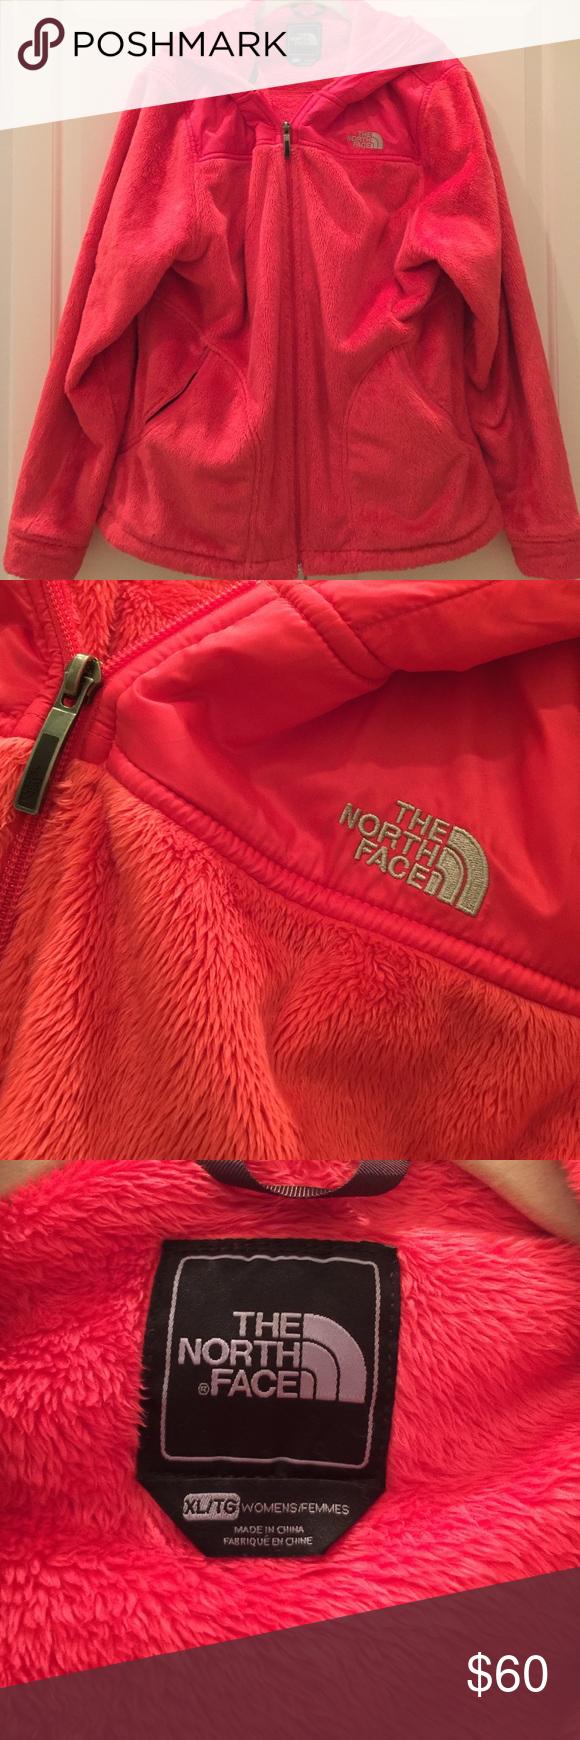 Hot Pink North Face Teddy Bear Fleece Jacket Pink North Face Fleece Jacket Hot Pink [ 1740 x 580 Pixel ]